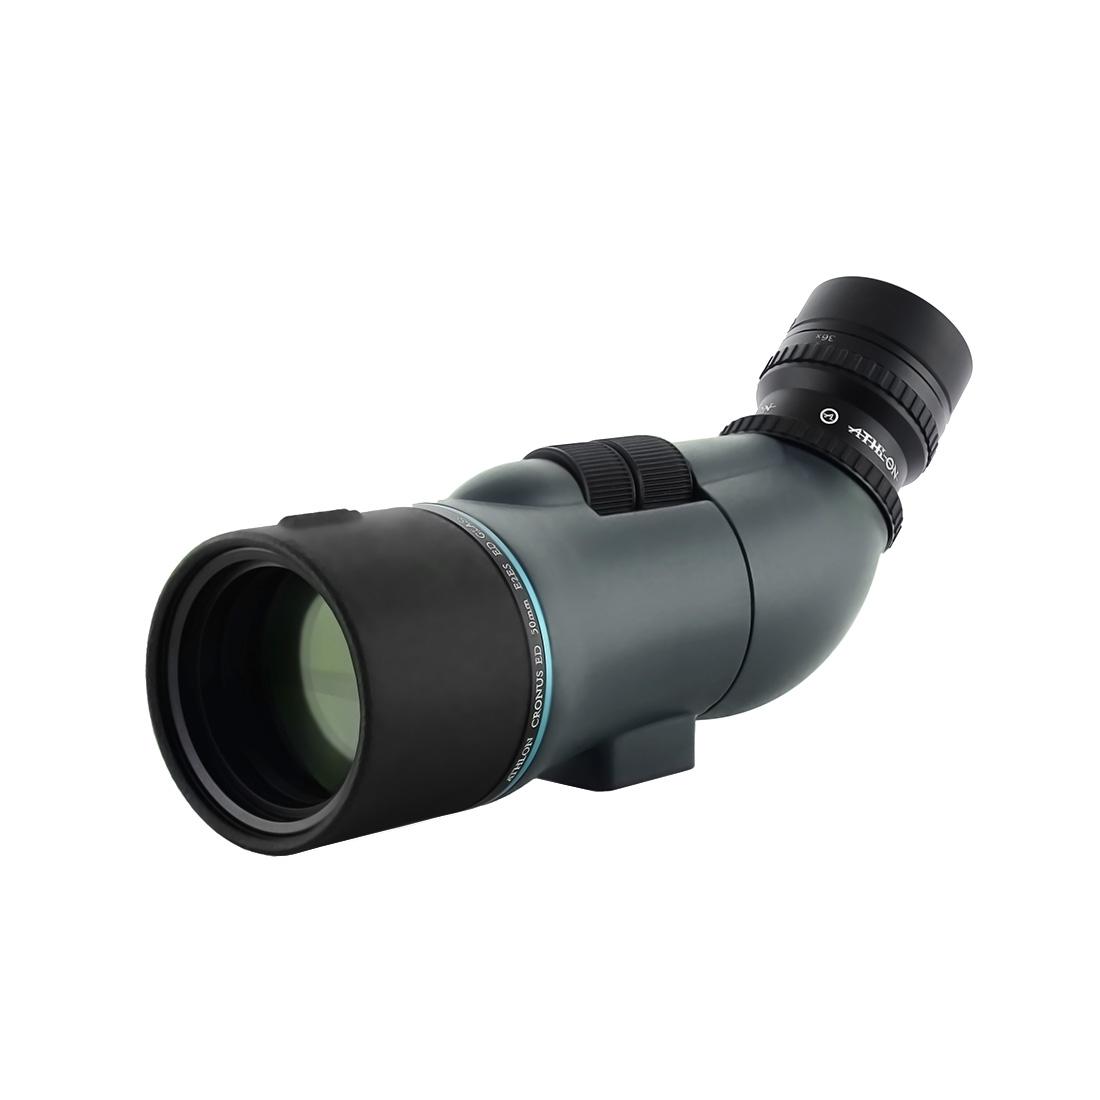 AthlonCronusED-12-36x50-Spotting-scope-angle-view.jpg